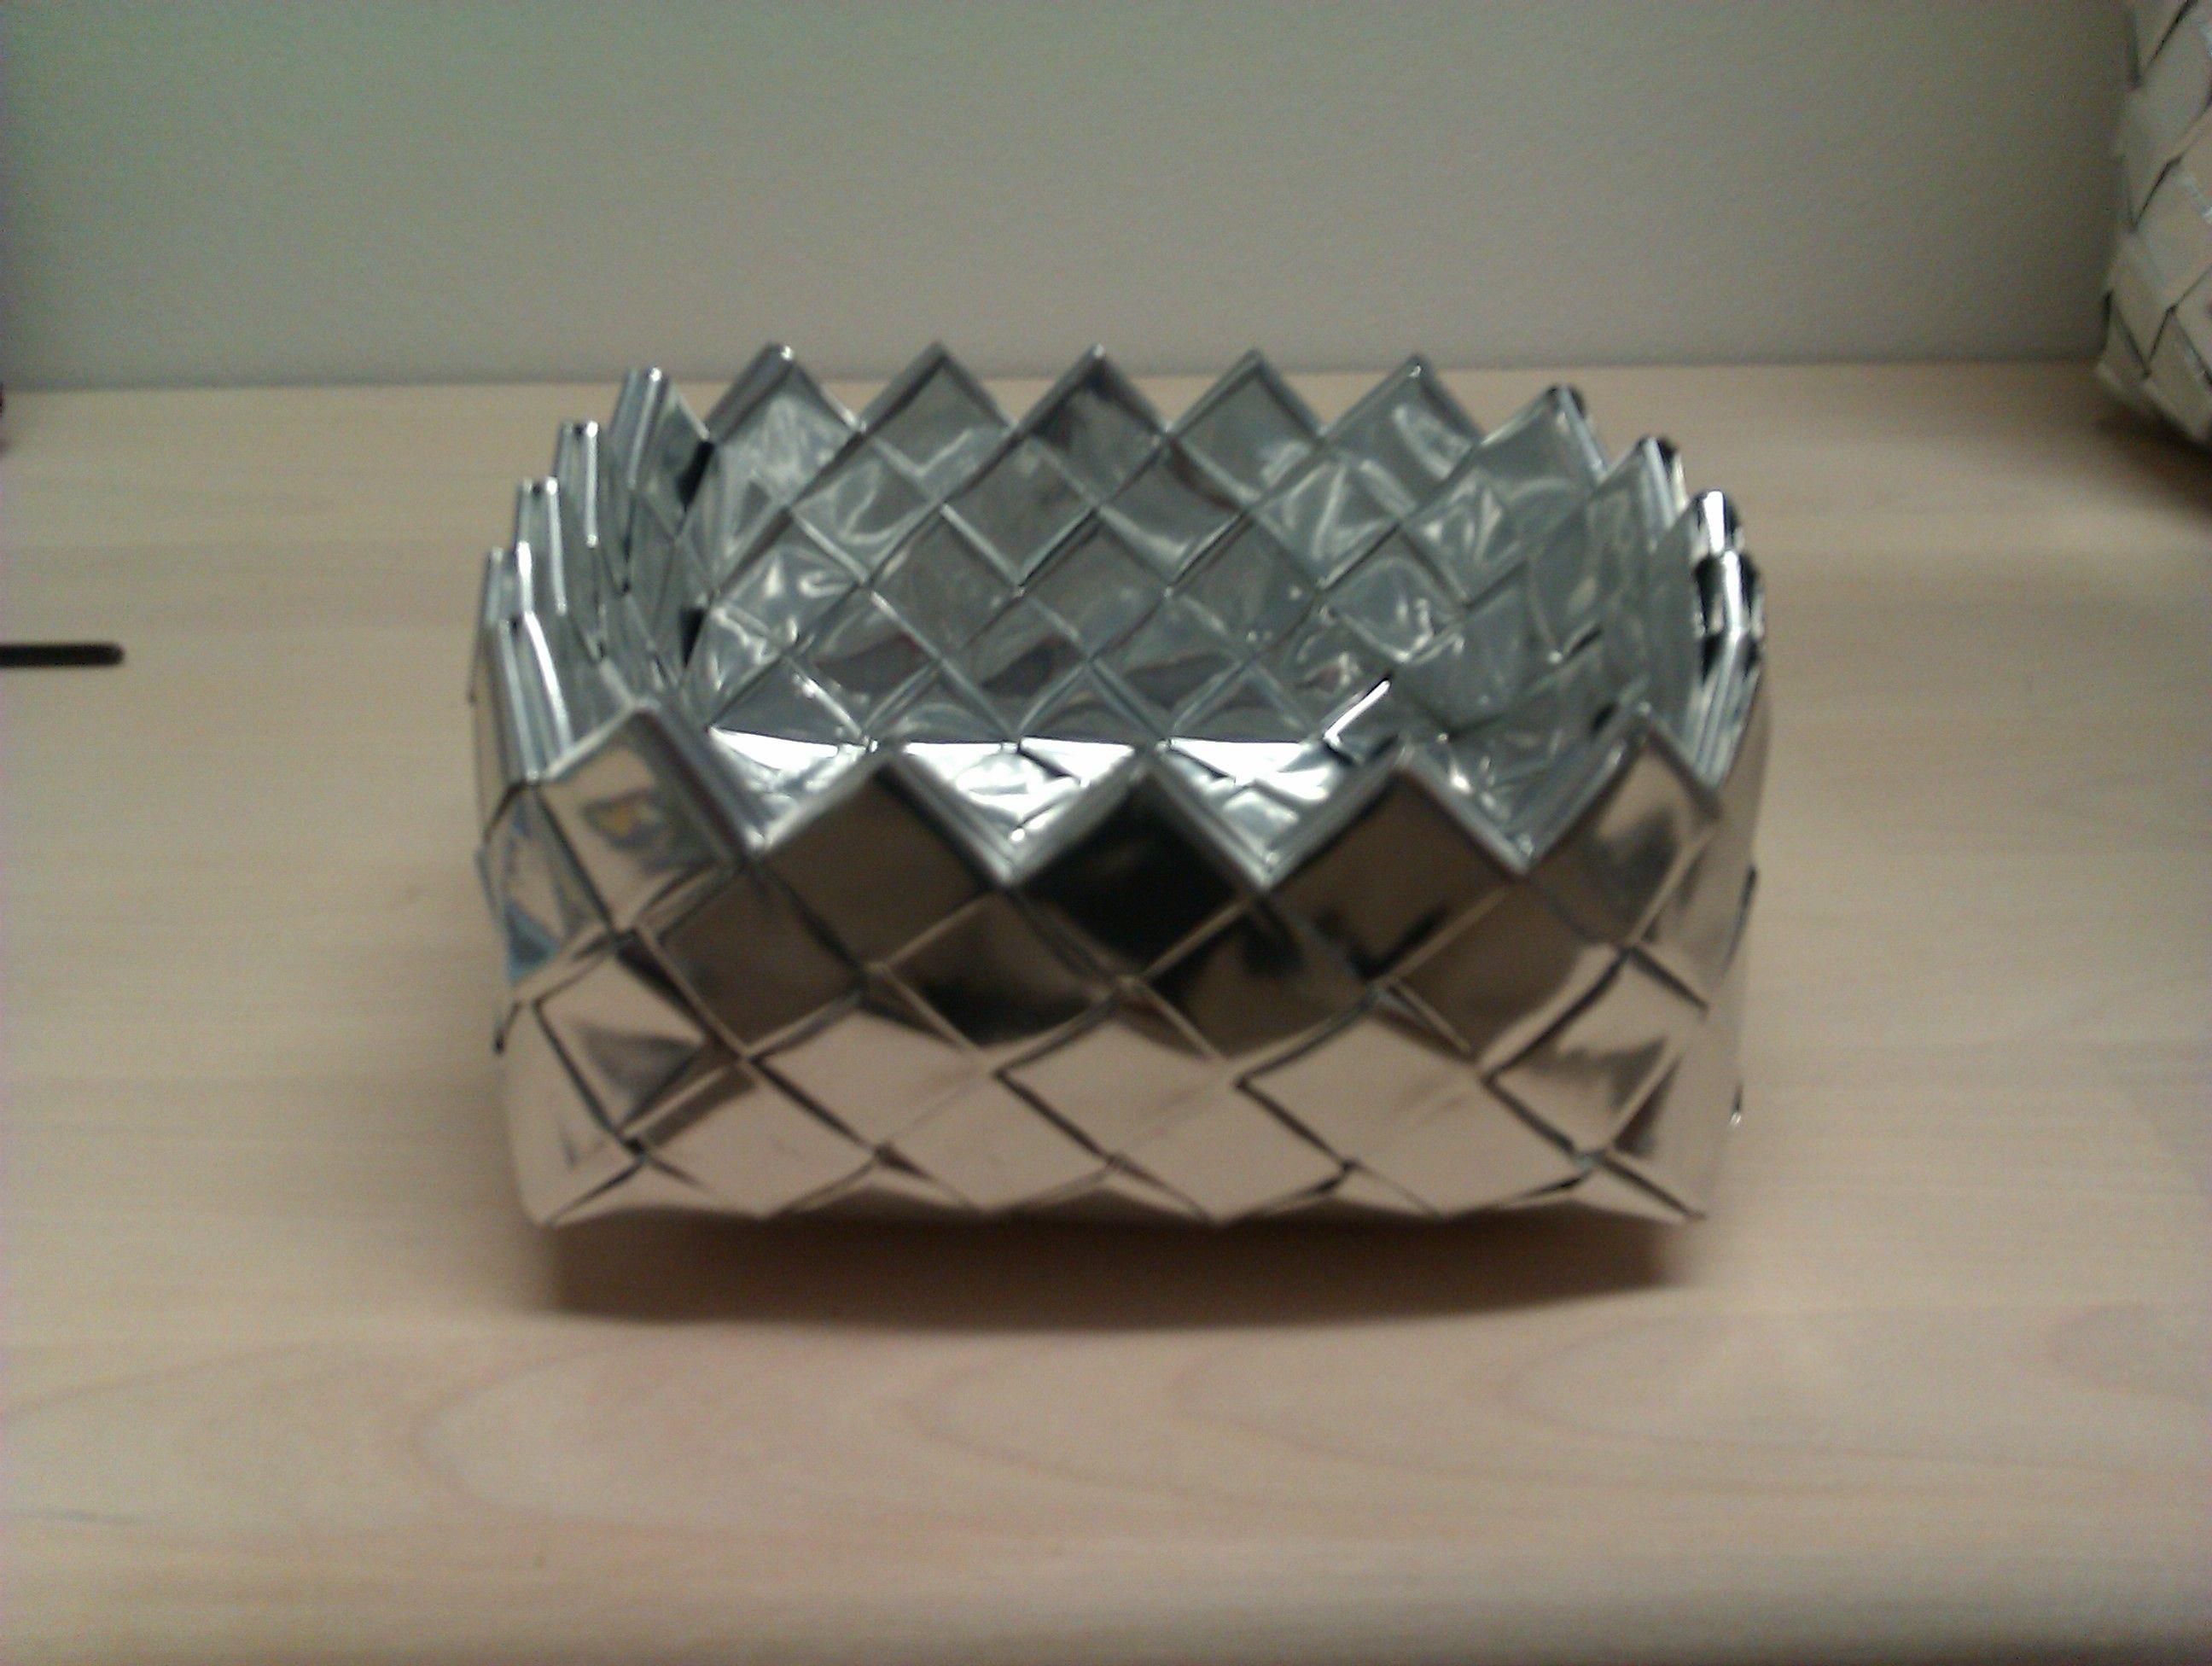 Sølv kurv - Britta Hjorth